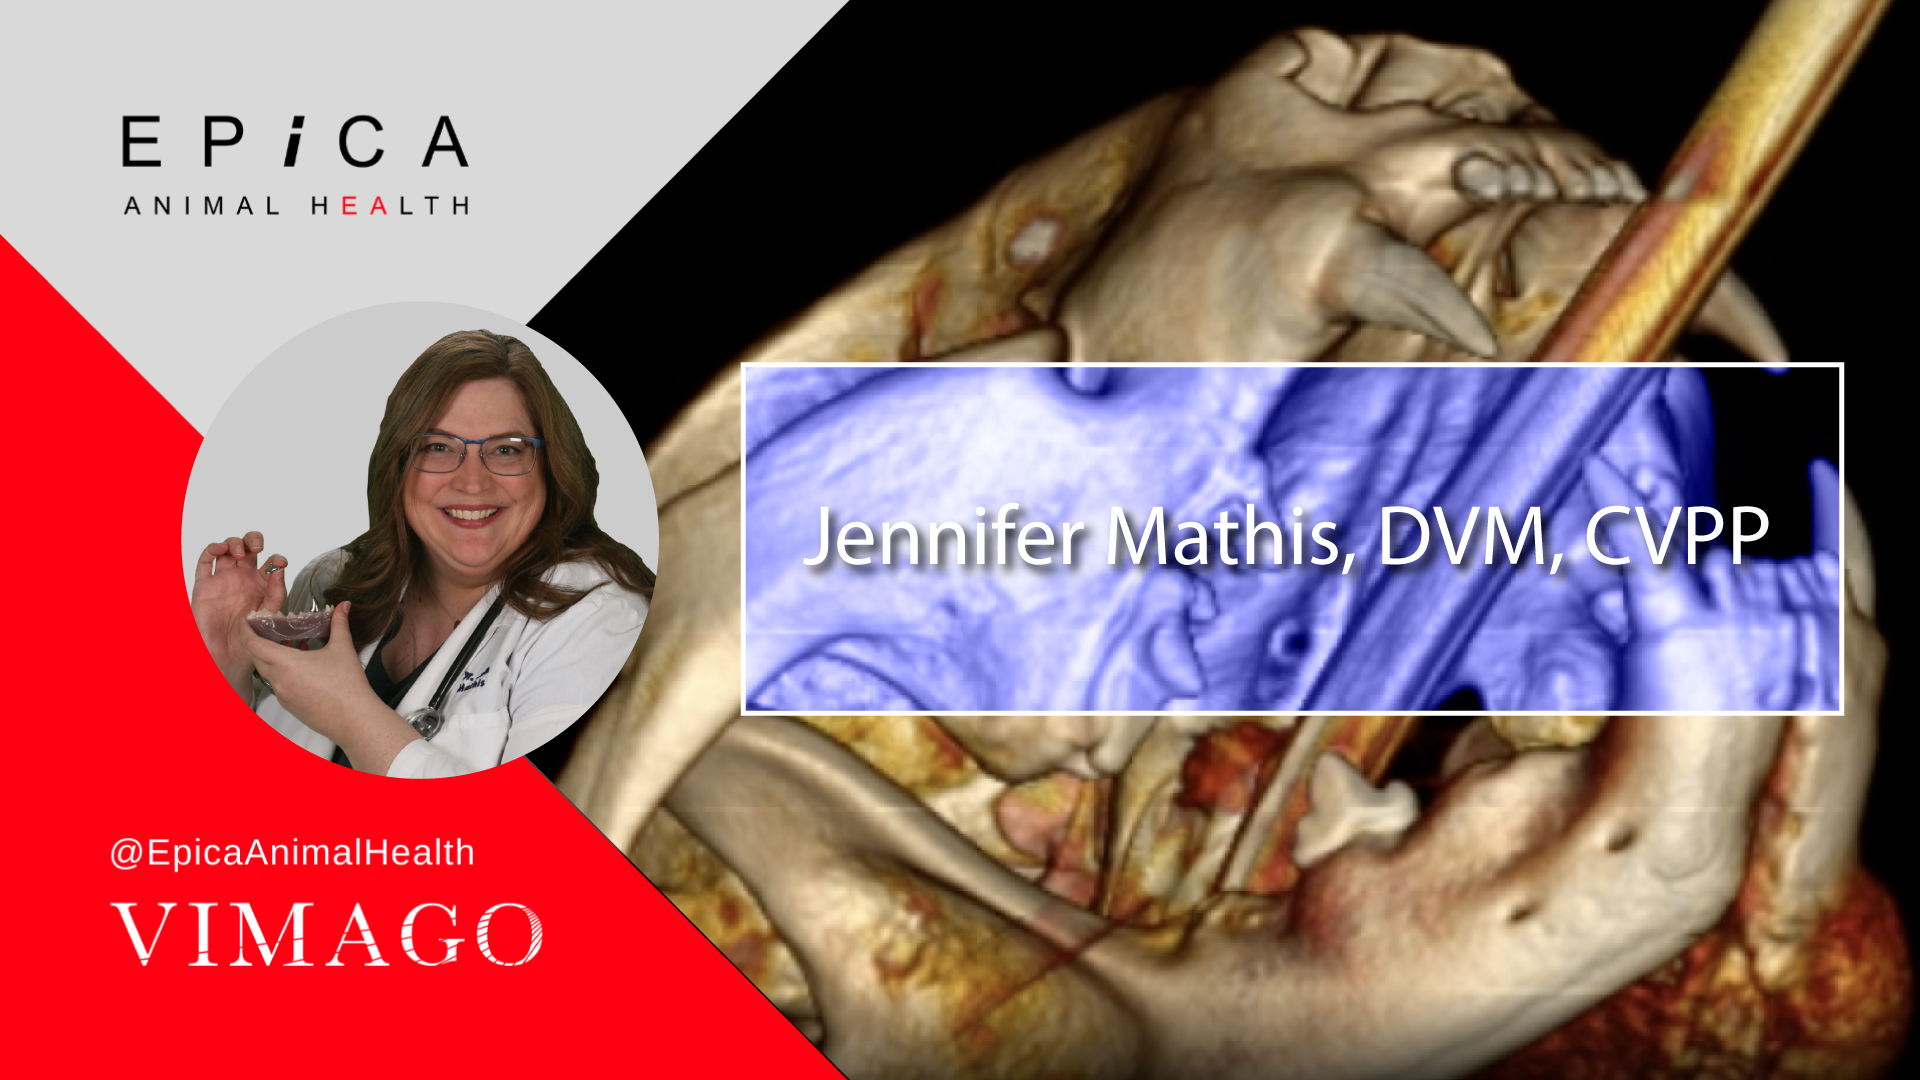 EAH-2021---Vimago-E-Report-Web-Banner---Jennifer-Mathis-DVM---1080x1920-V4